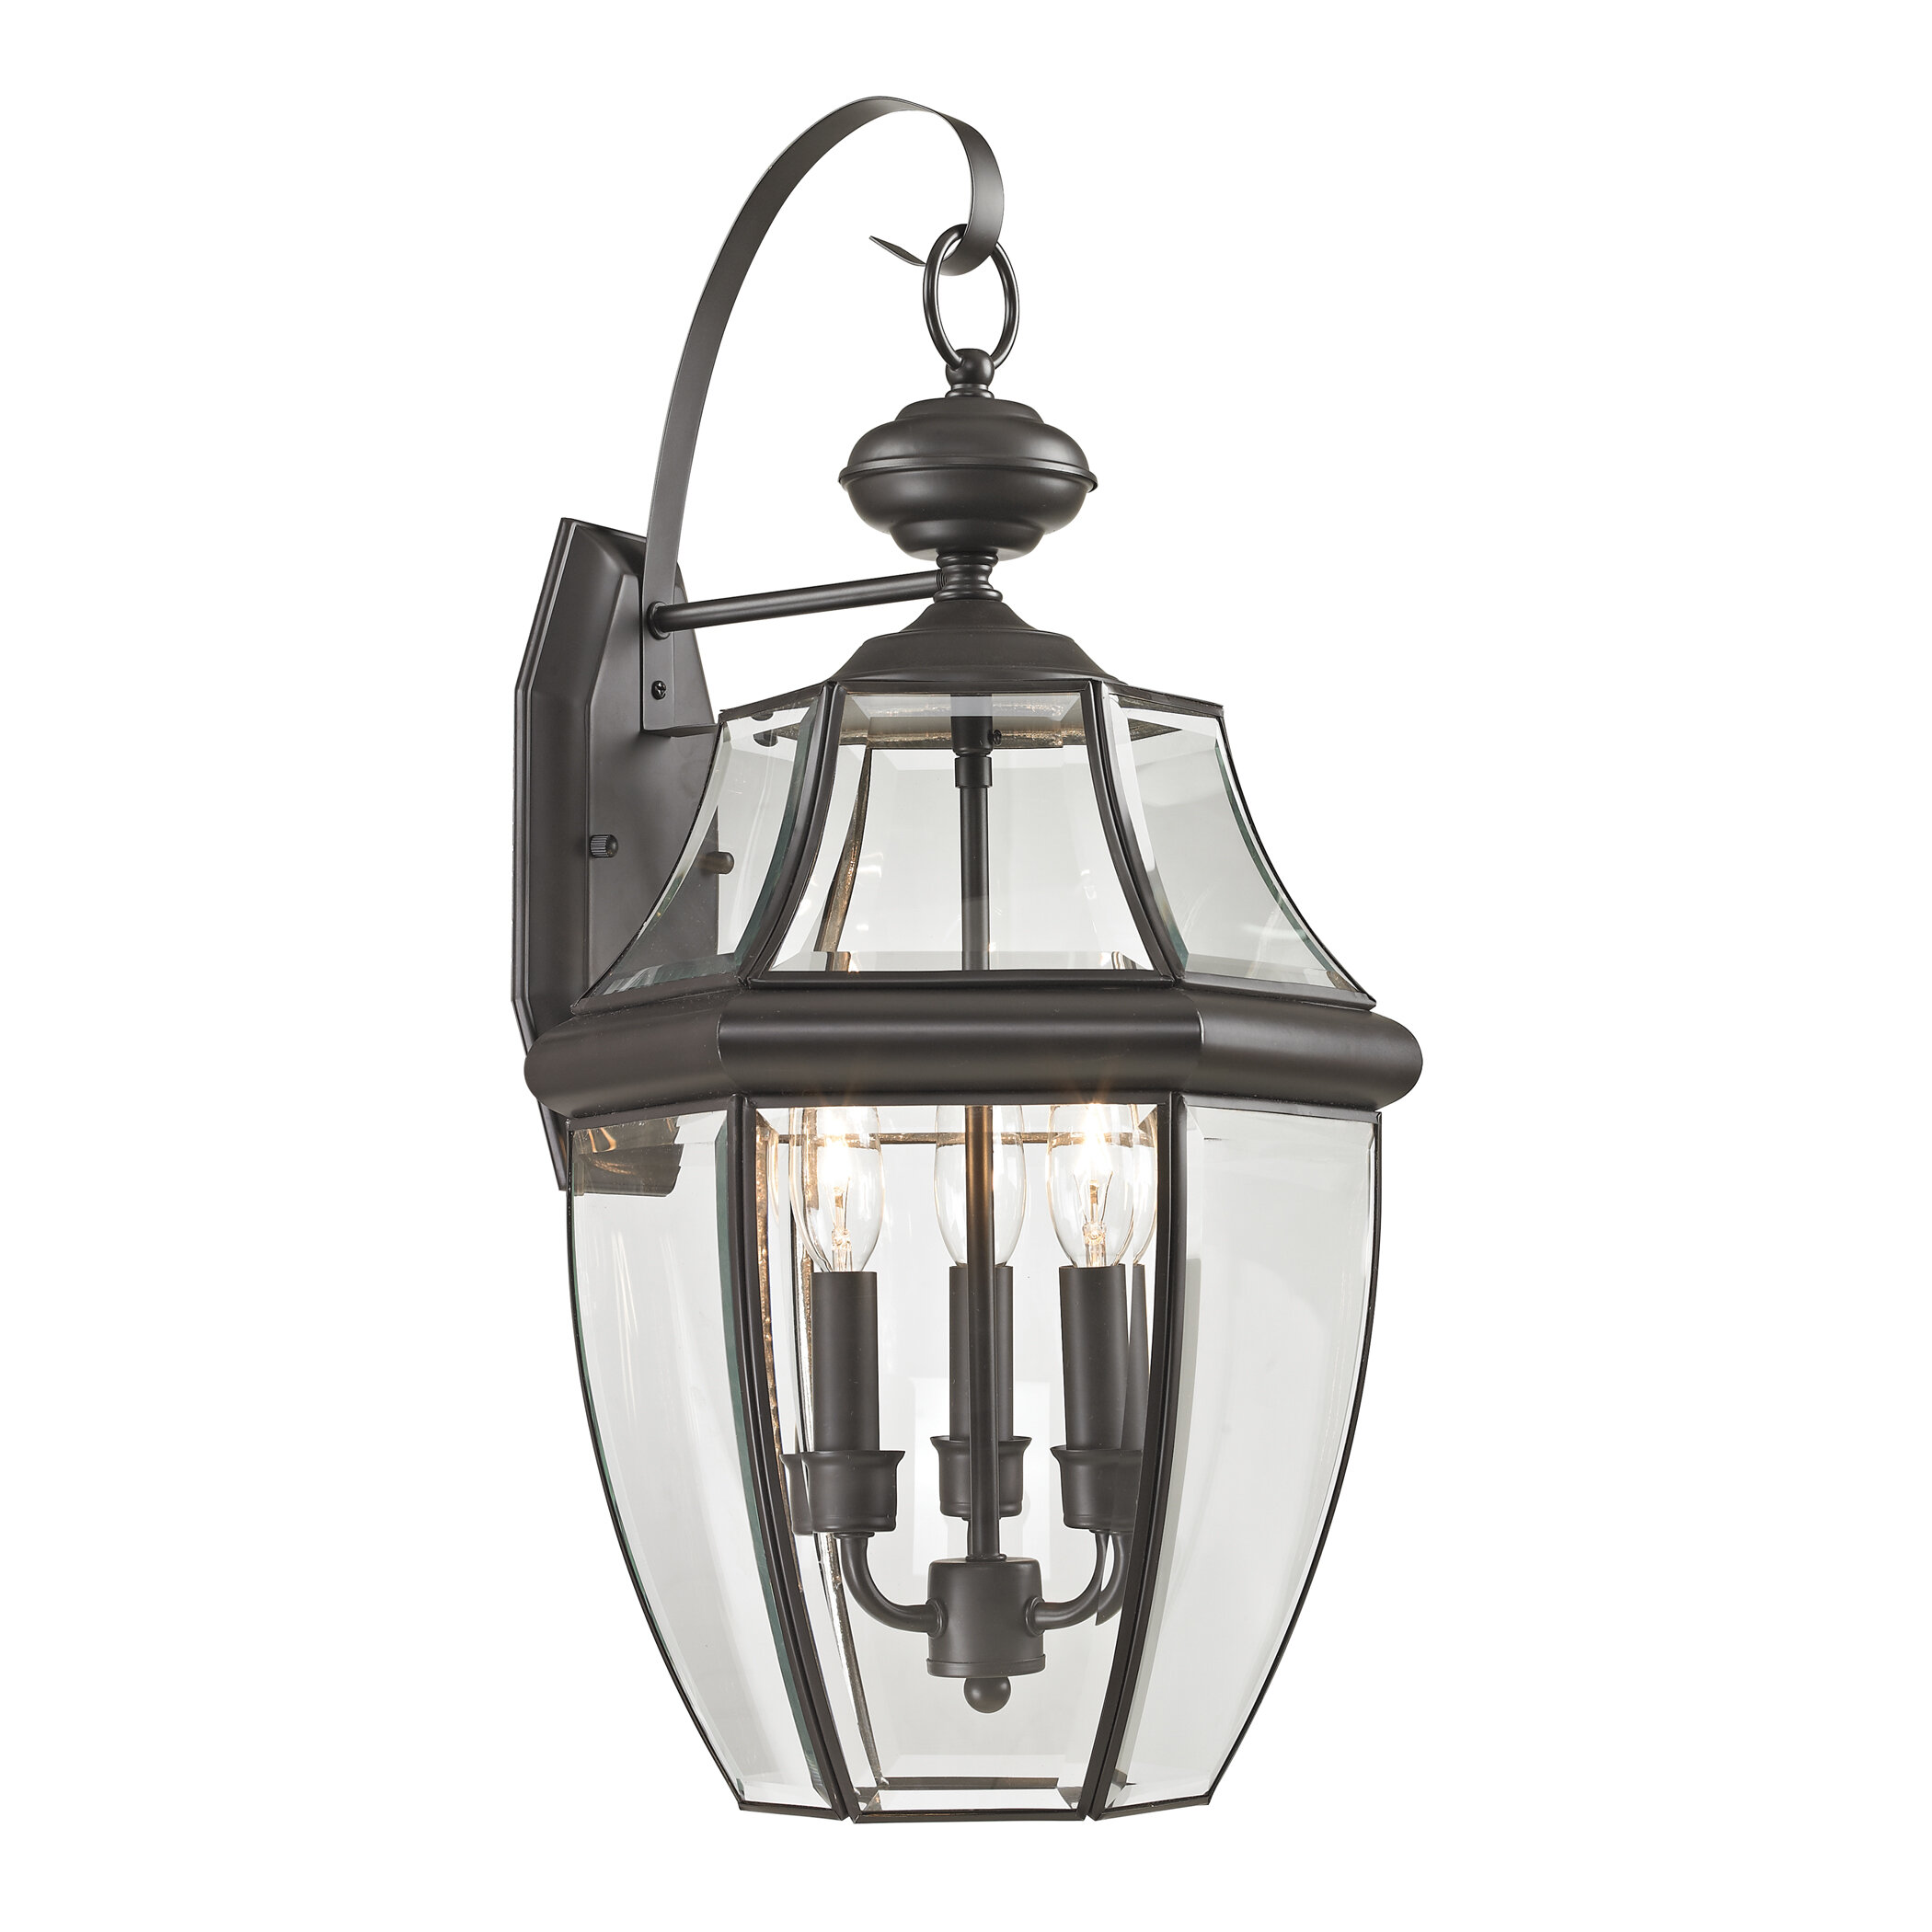 Ashford 2 Light Outdoor Wall Lantern. By Cornerstone Lighting